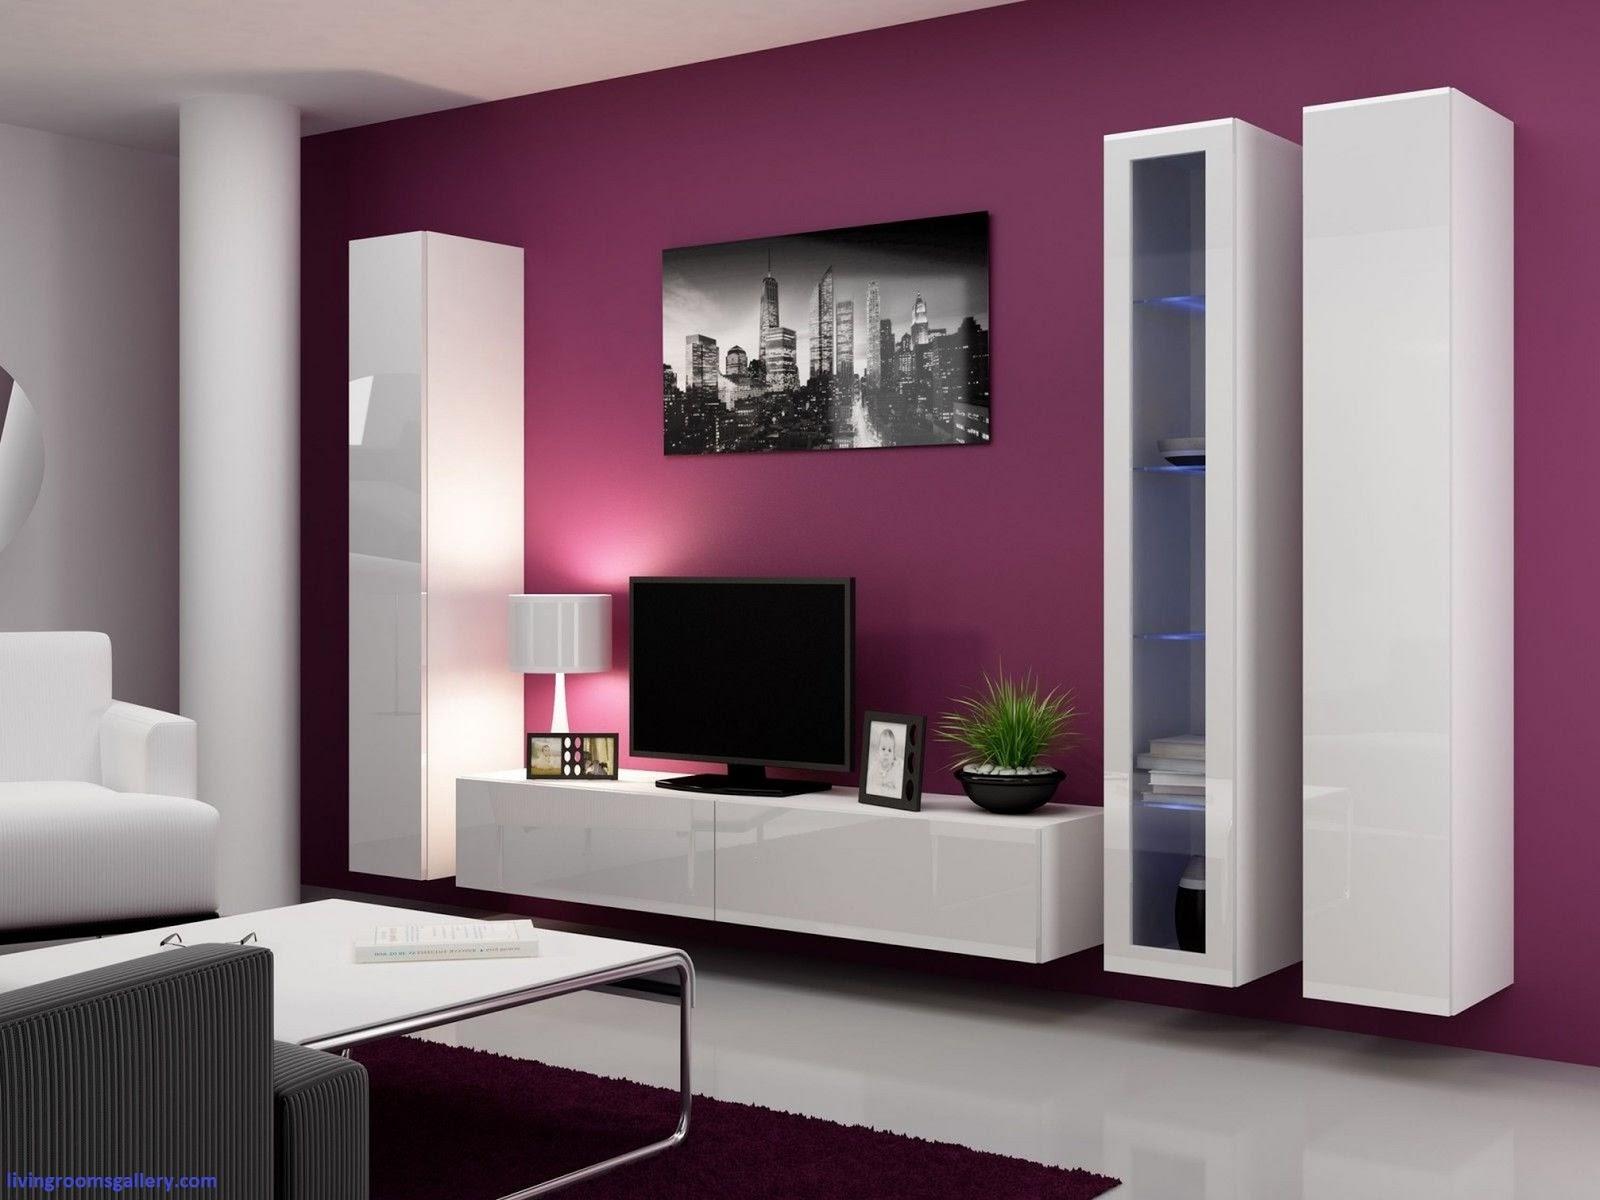 tv wall unit design ideas photo - 2